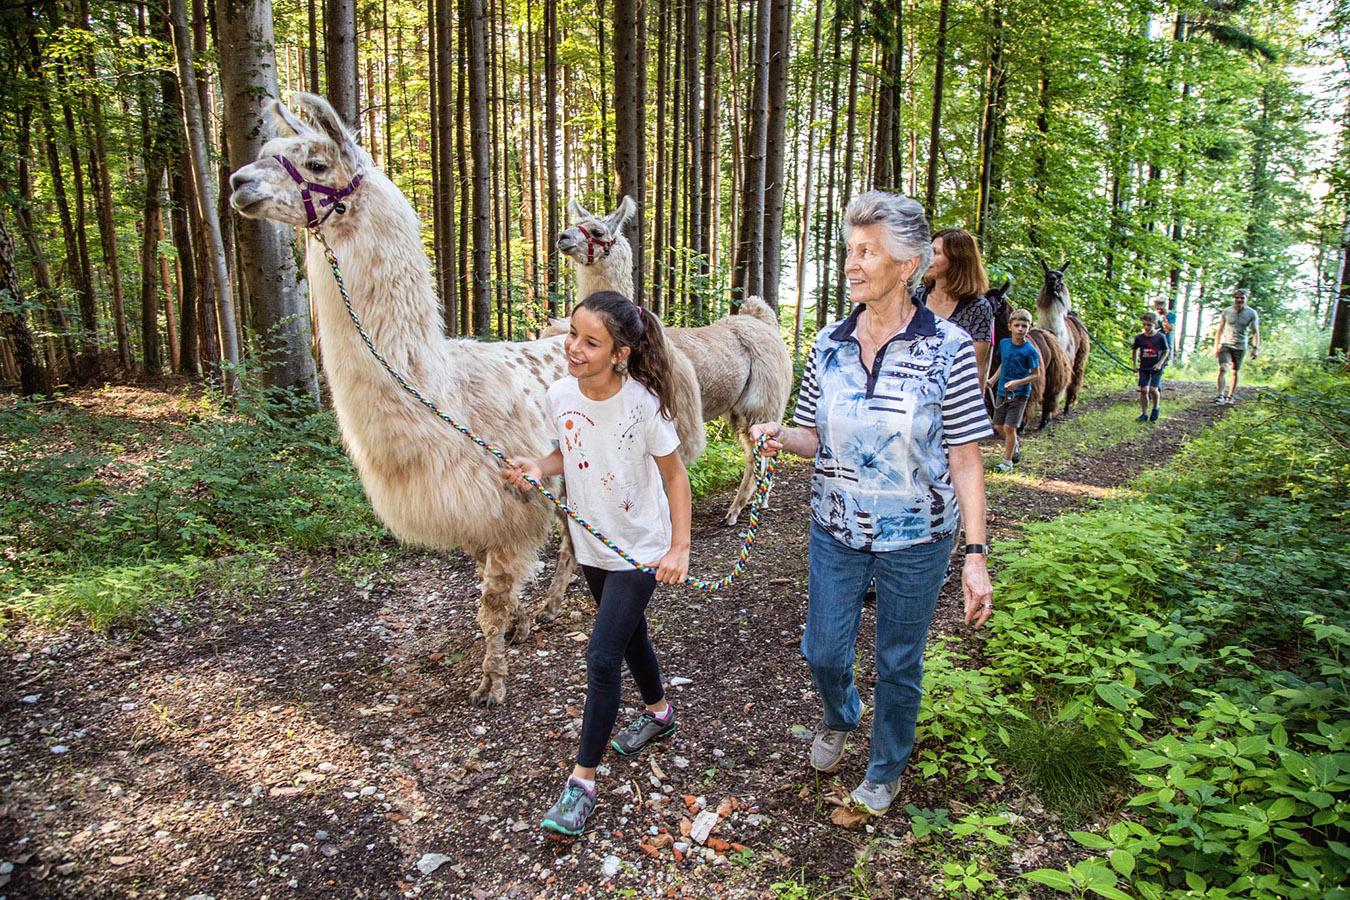 Lama Wanderung am Waginger See, Oberbayern